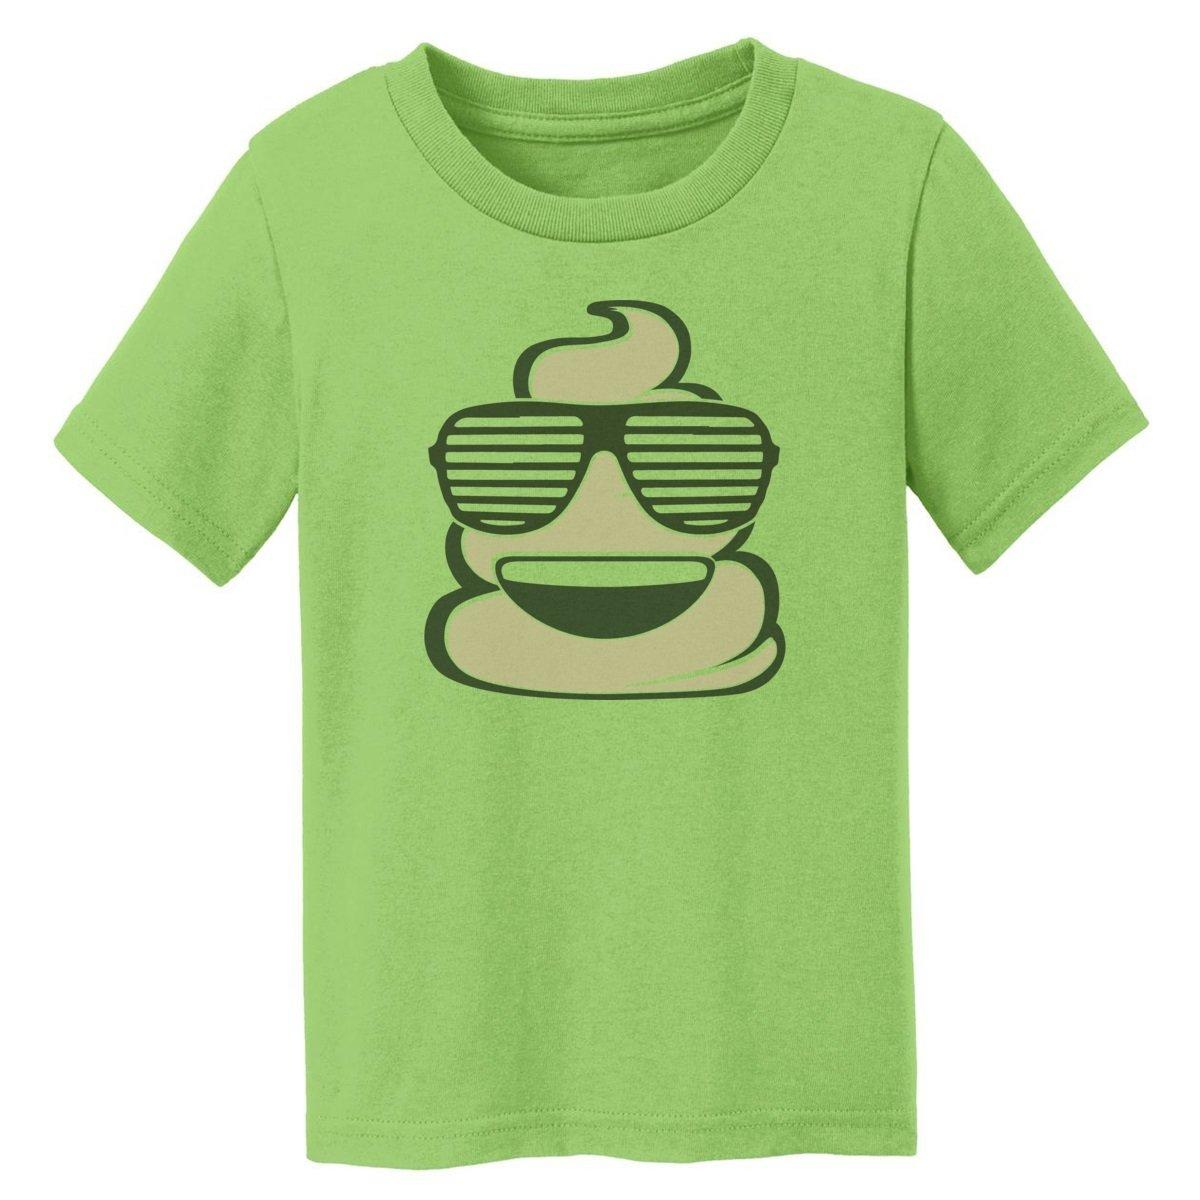 Digital T-Shirt Shop Baby-girls Cool Emoji Poop with Sunglasses